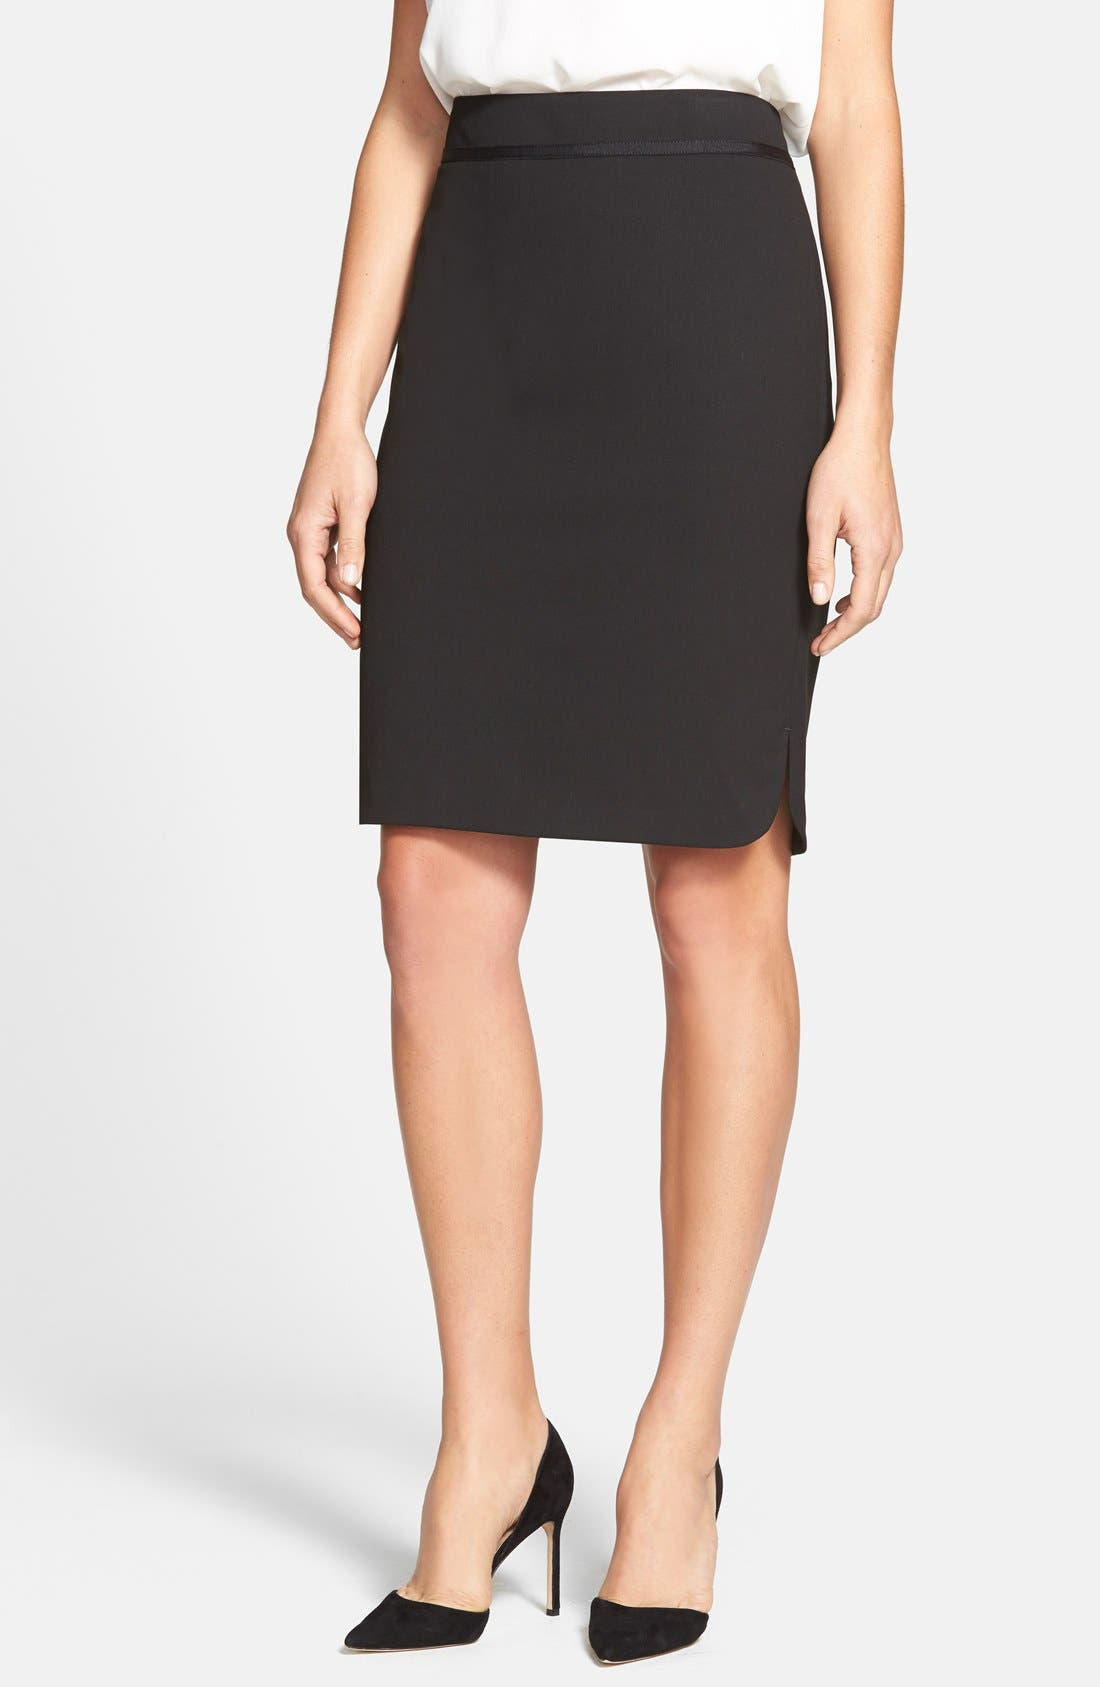 Alternate Image 1 Selected - Jones New York 'Lucy' Ribbon Trim Pencil Skirt